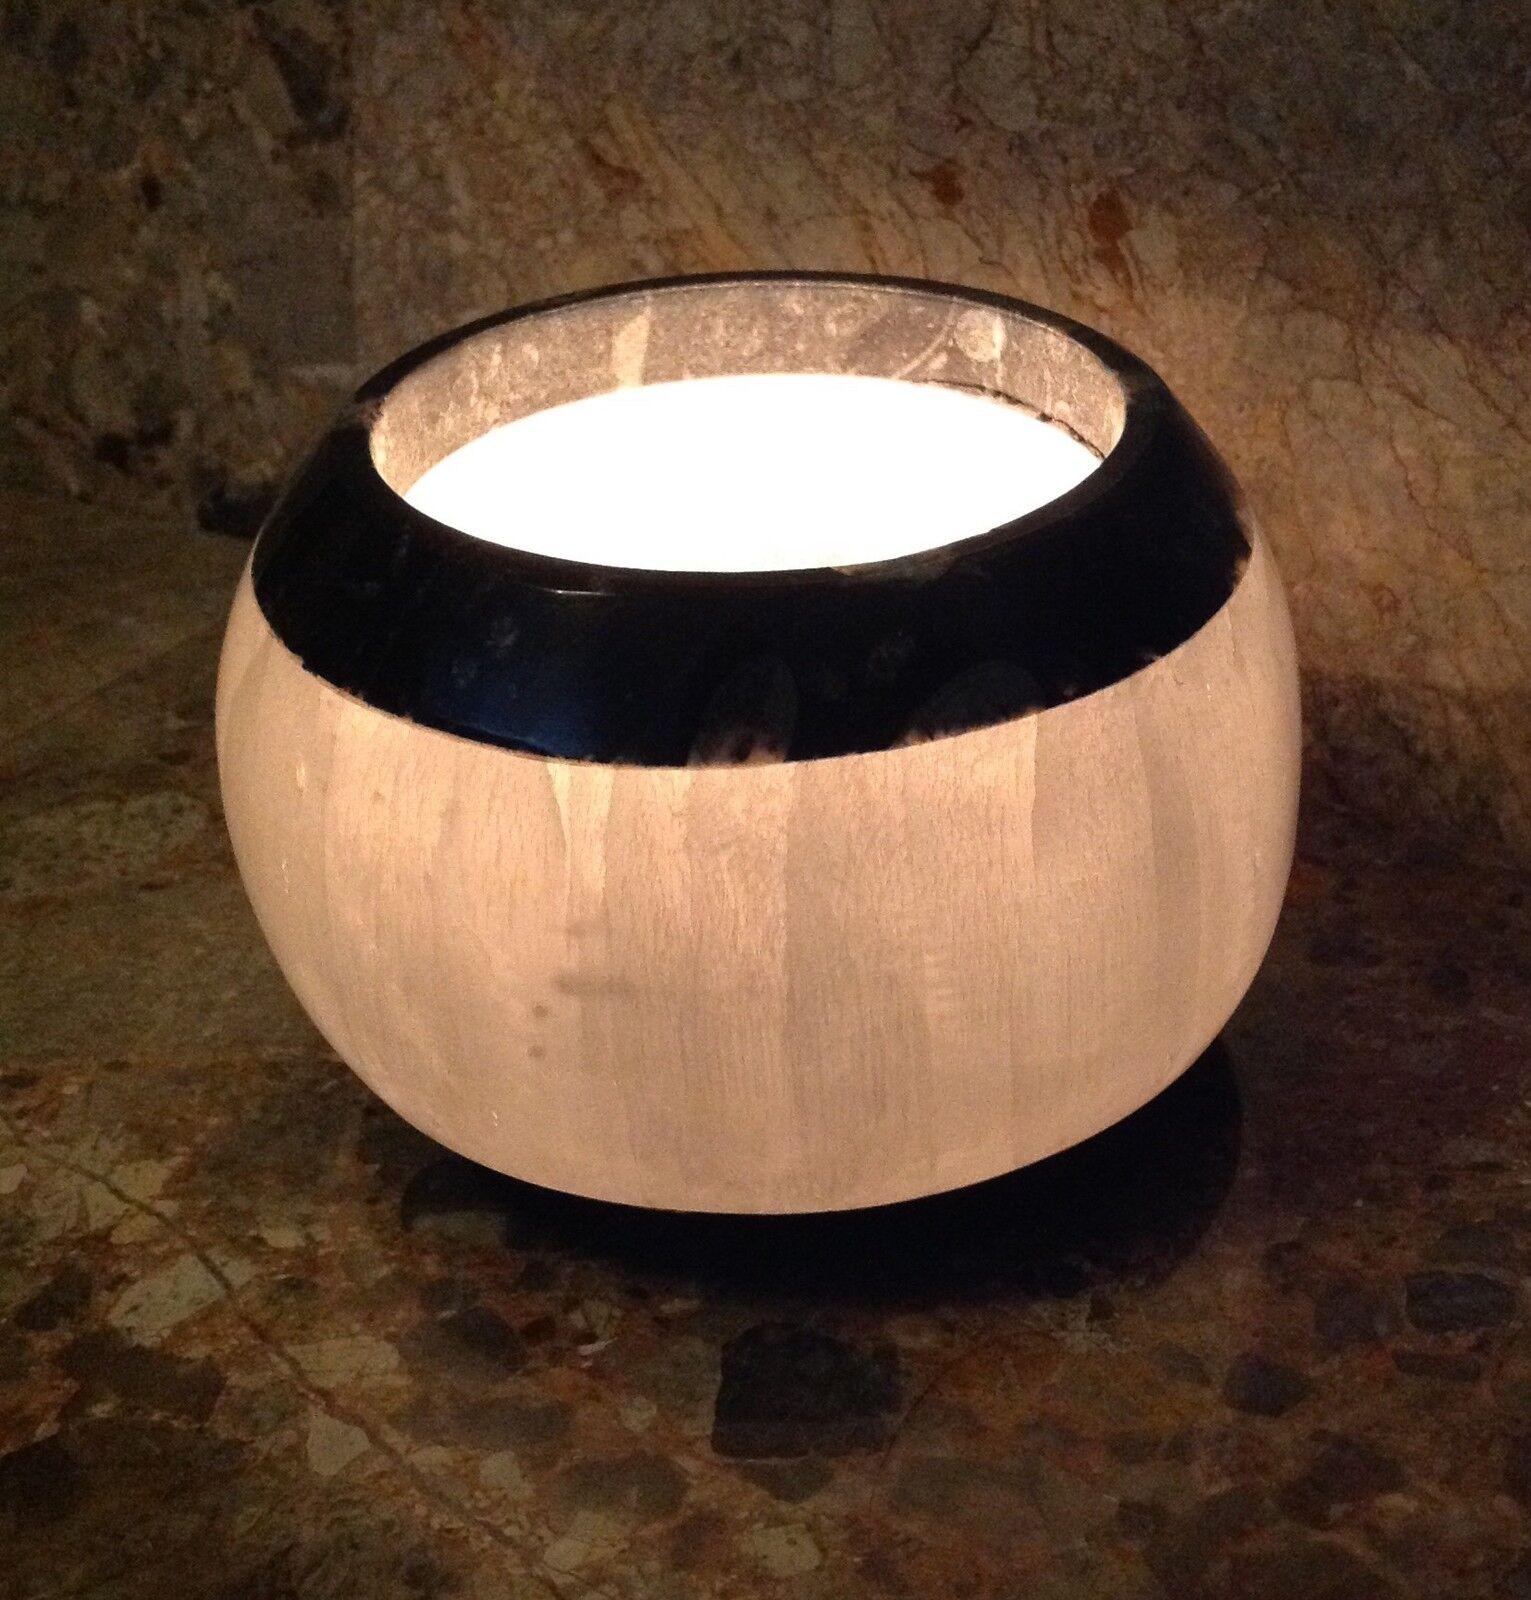 Selenita Angel Piedra Cristal & fósil candelita sostenedor de vela, Tazón Grande 1.5kg